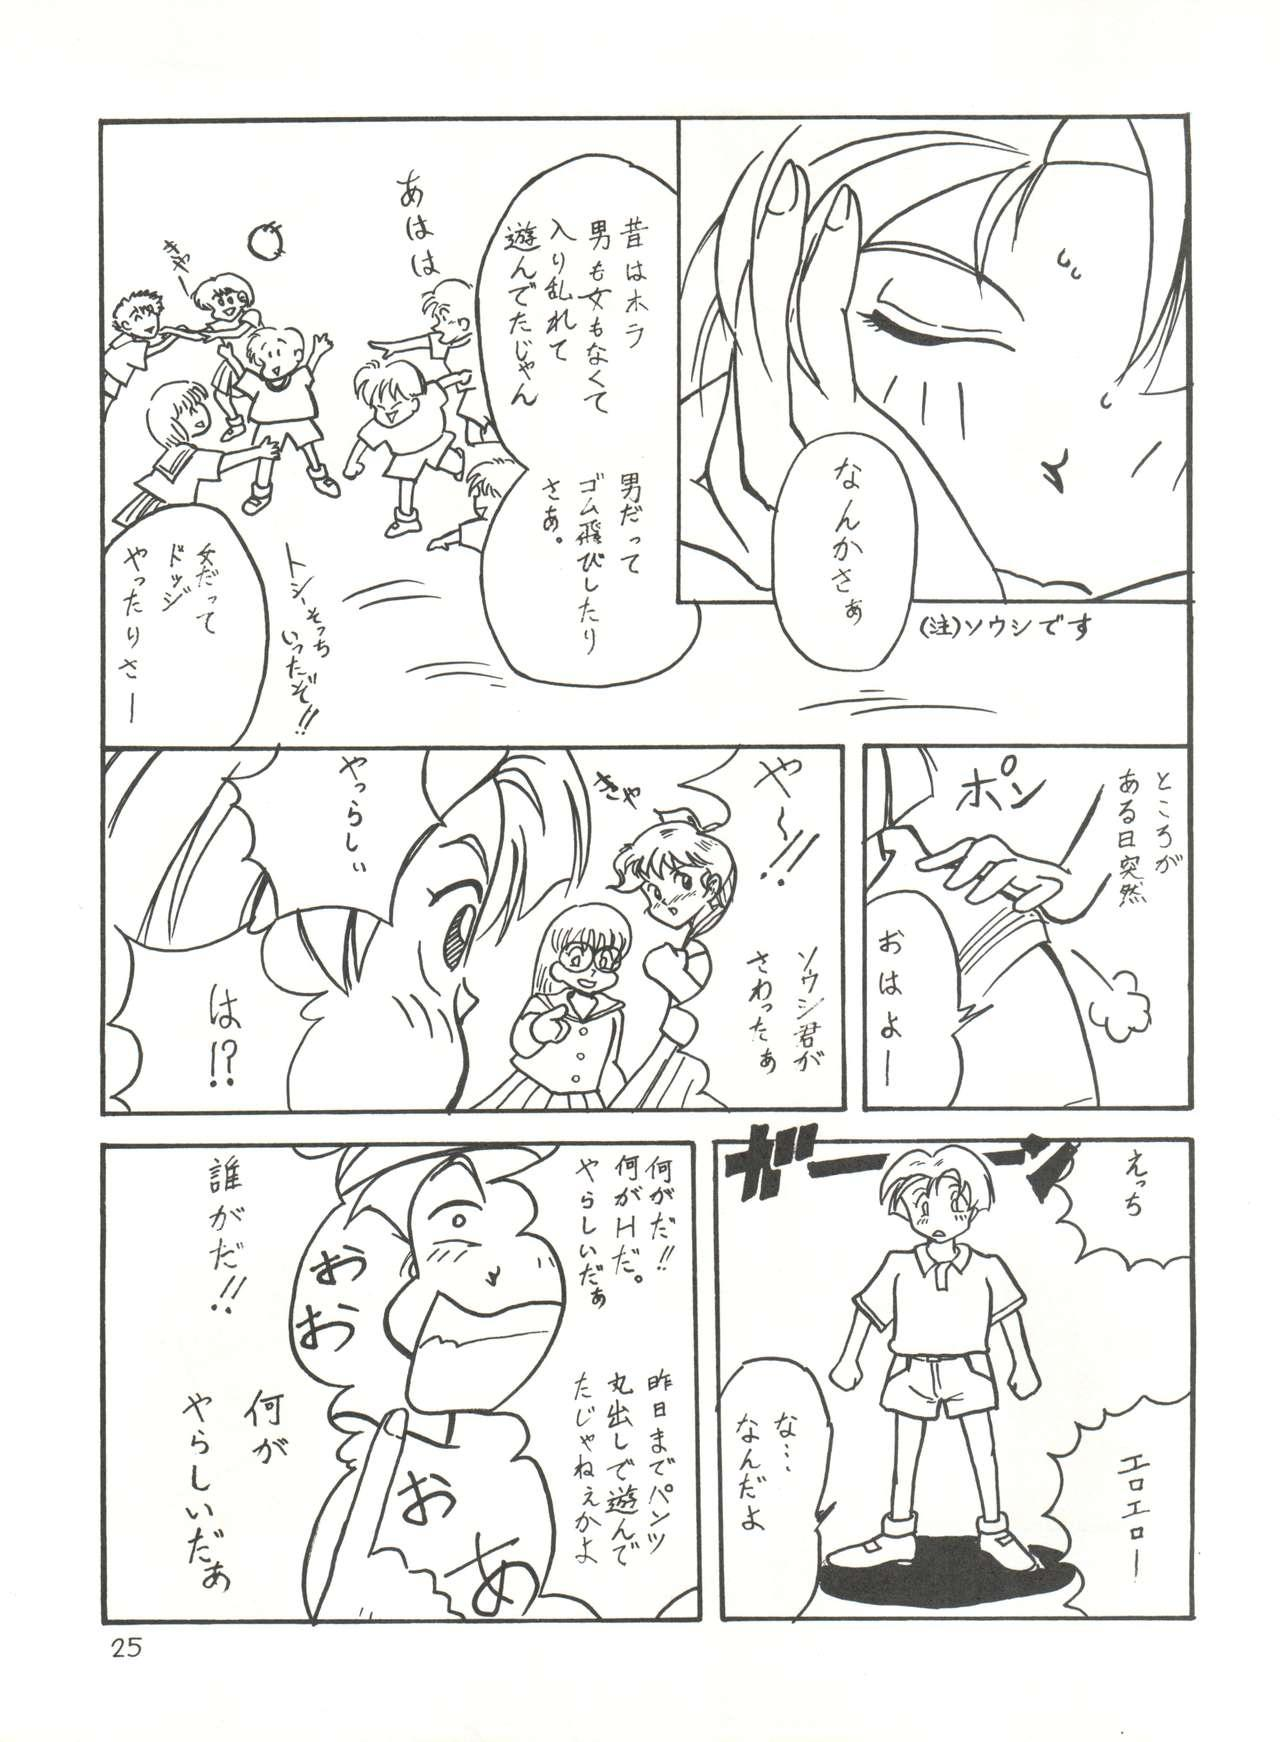 Kaiketsu Spats 24